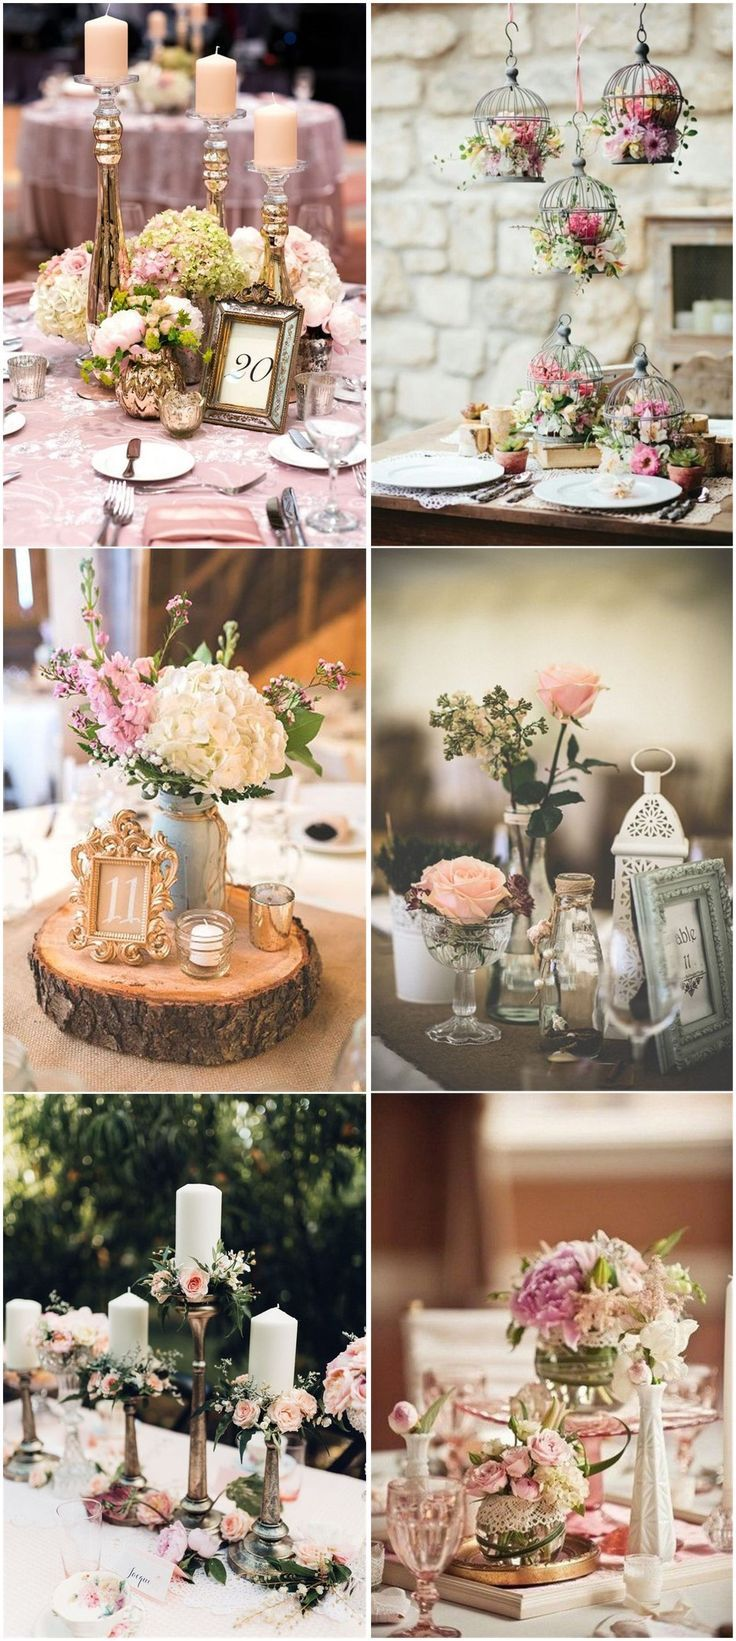 Bodas vintage »26 centros de mesa de boda vintage que convierten su boda en un … – Ideas para bodas